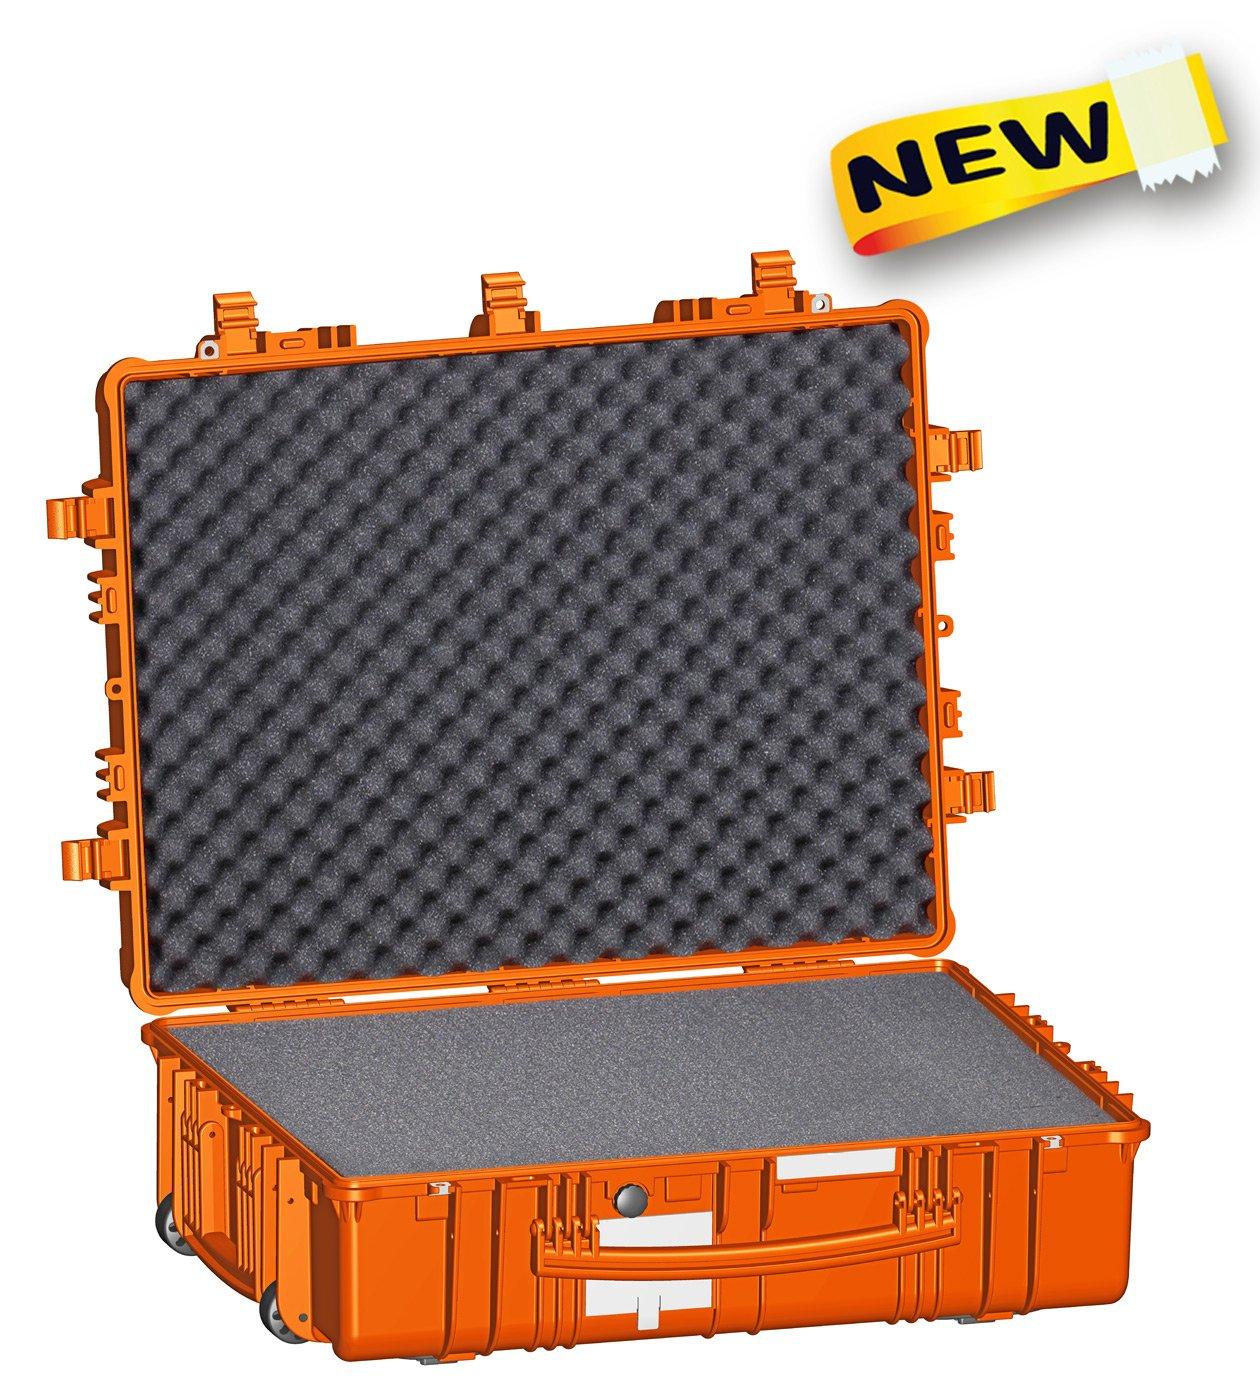 Explorer Cases 7726 O防水防塵多目的保護ケースwith Foamとホイール、オレンジ B01LB7V2A2